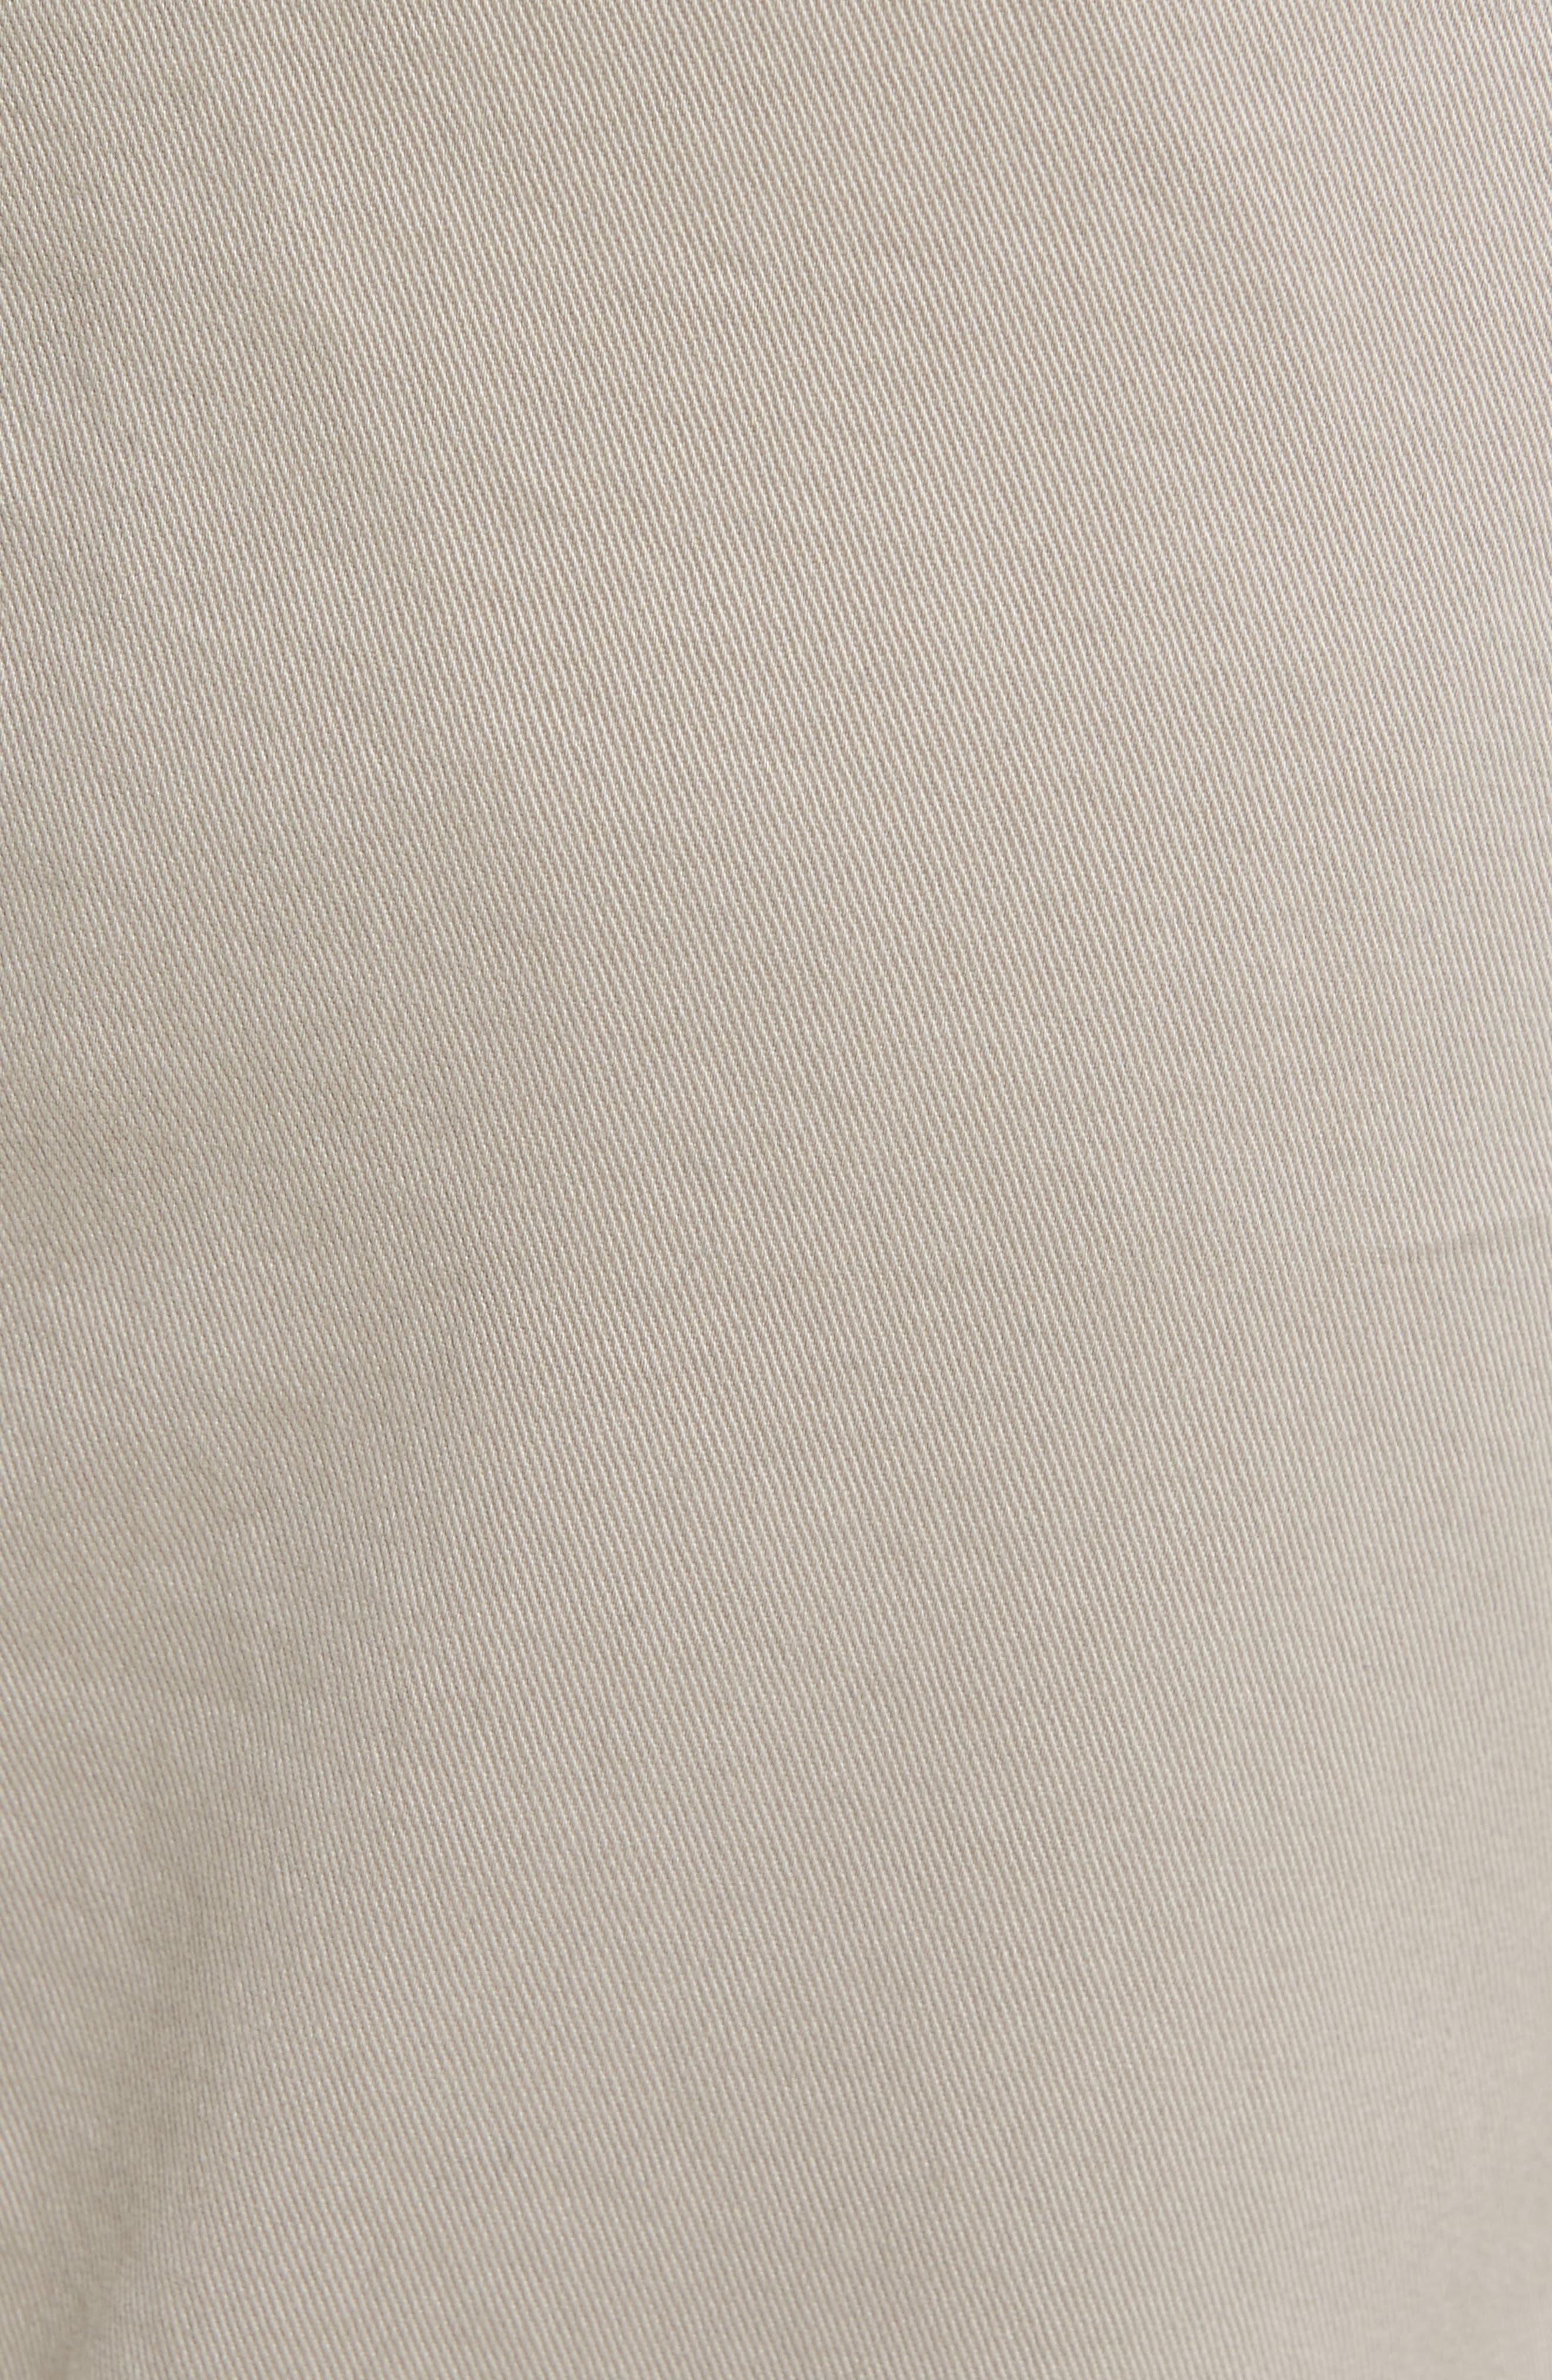 Lennox Skinny Fit Pants,                             Alternate thumbnail 5, color,                             Grey Coast